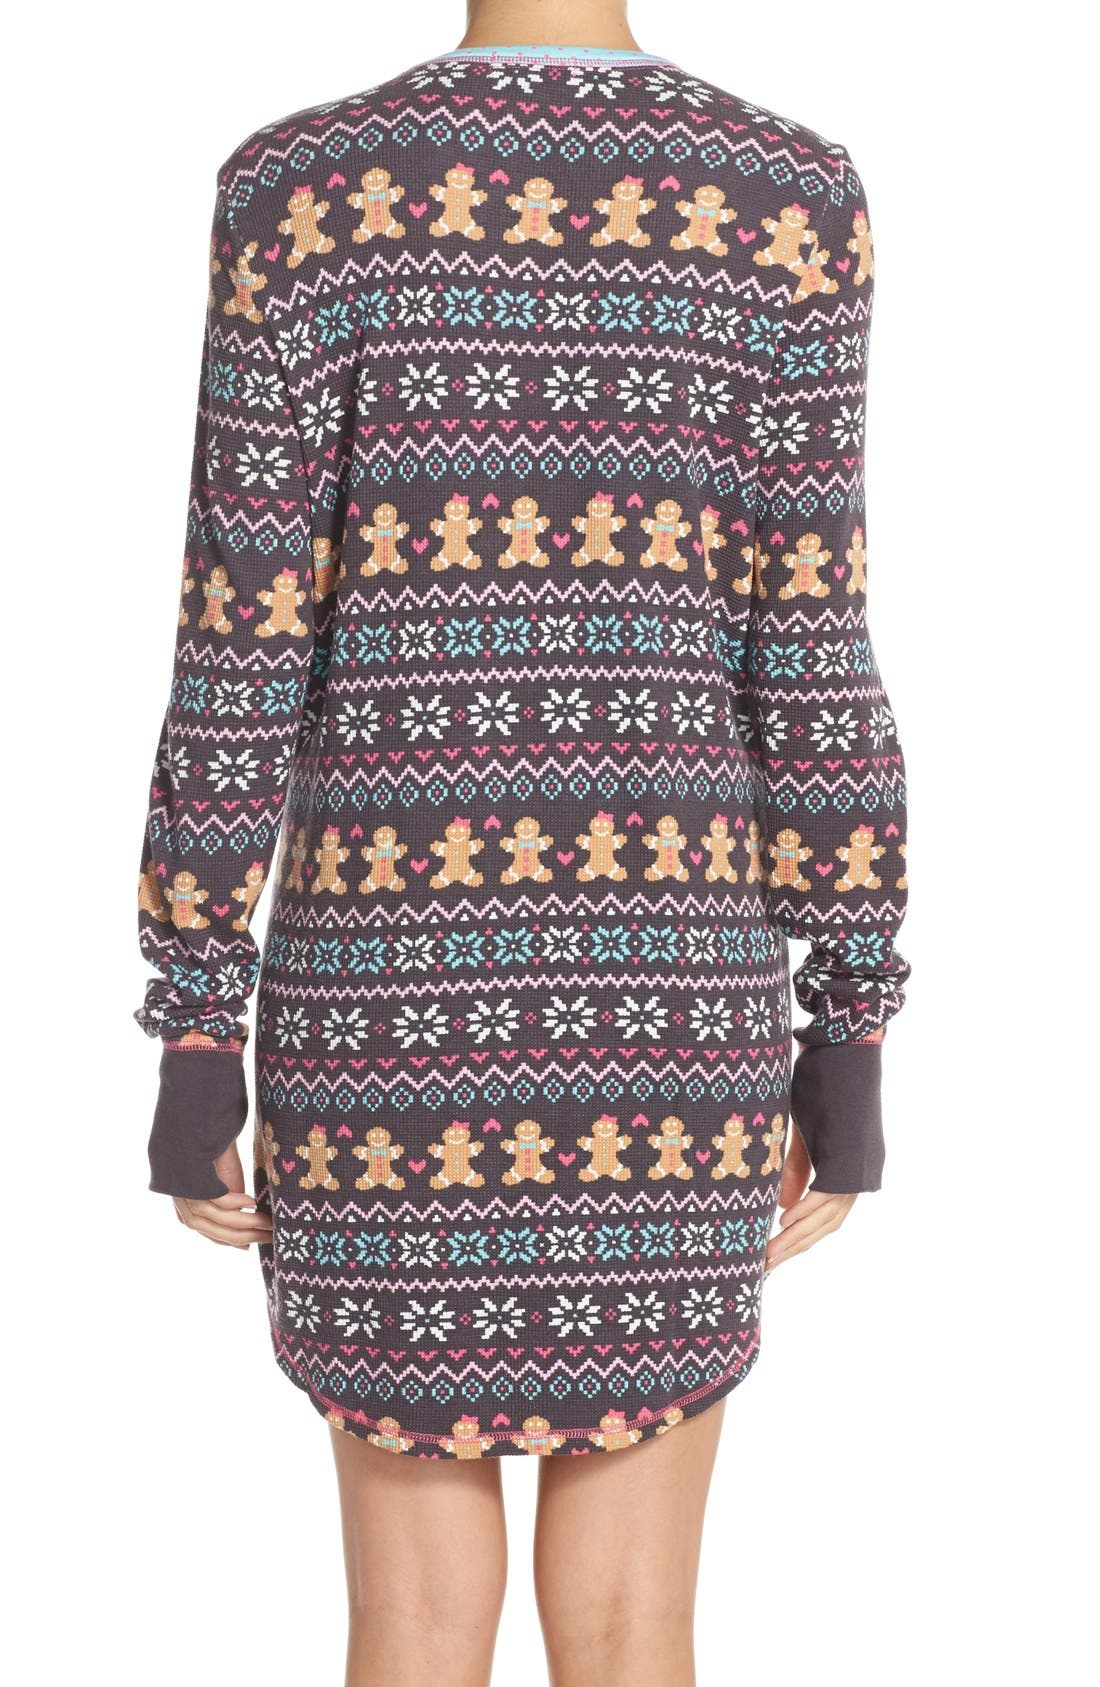 Thermal Knit Sleep Shirt,                             Alternate thumbnail 5, color,                             011